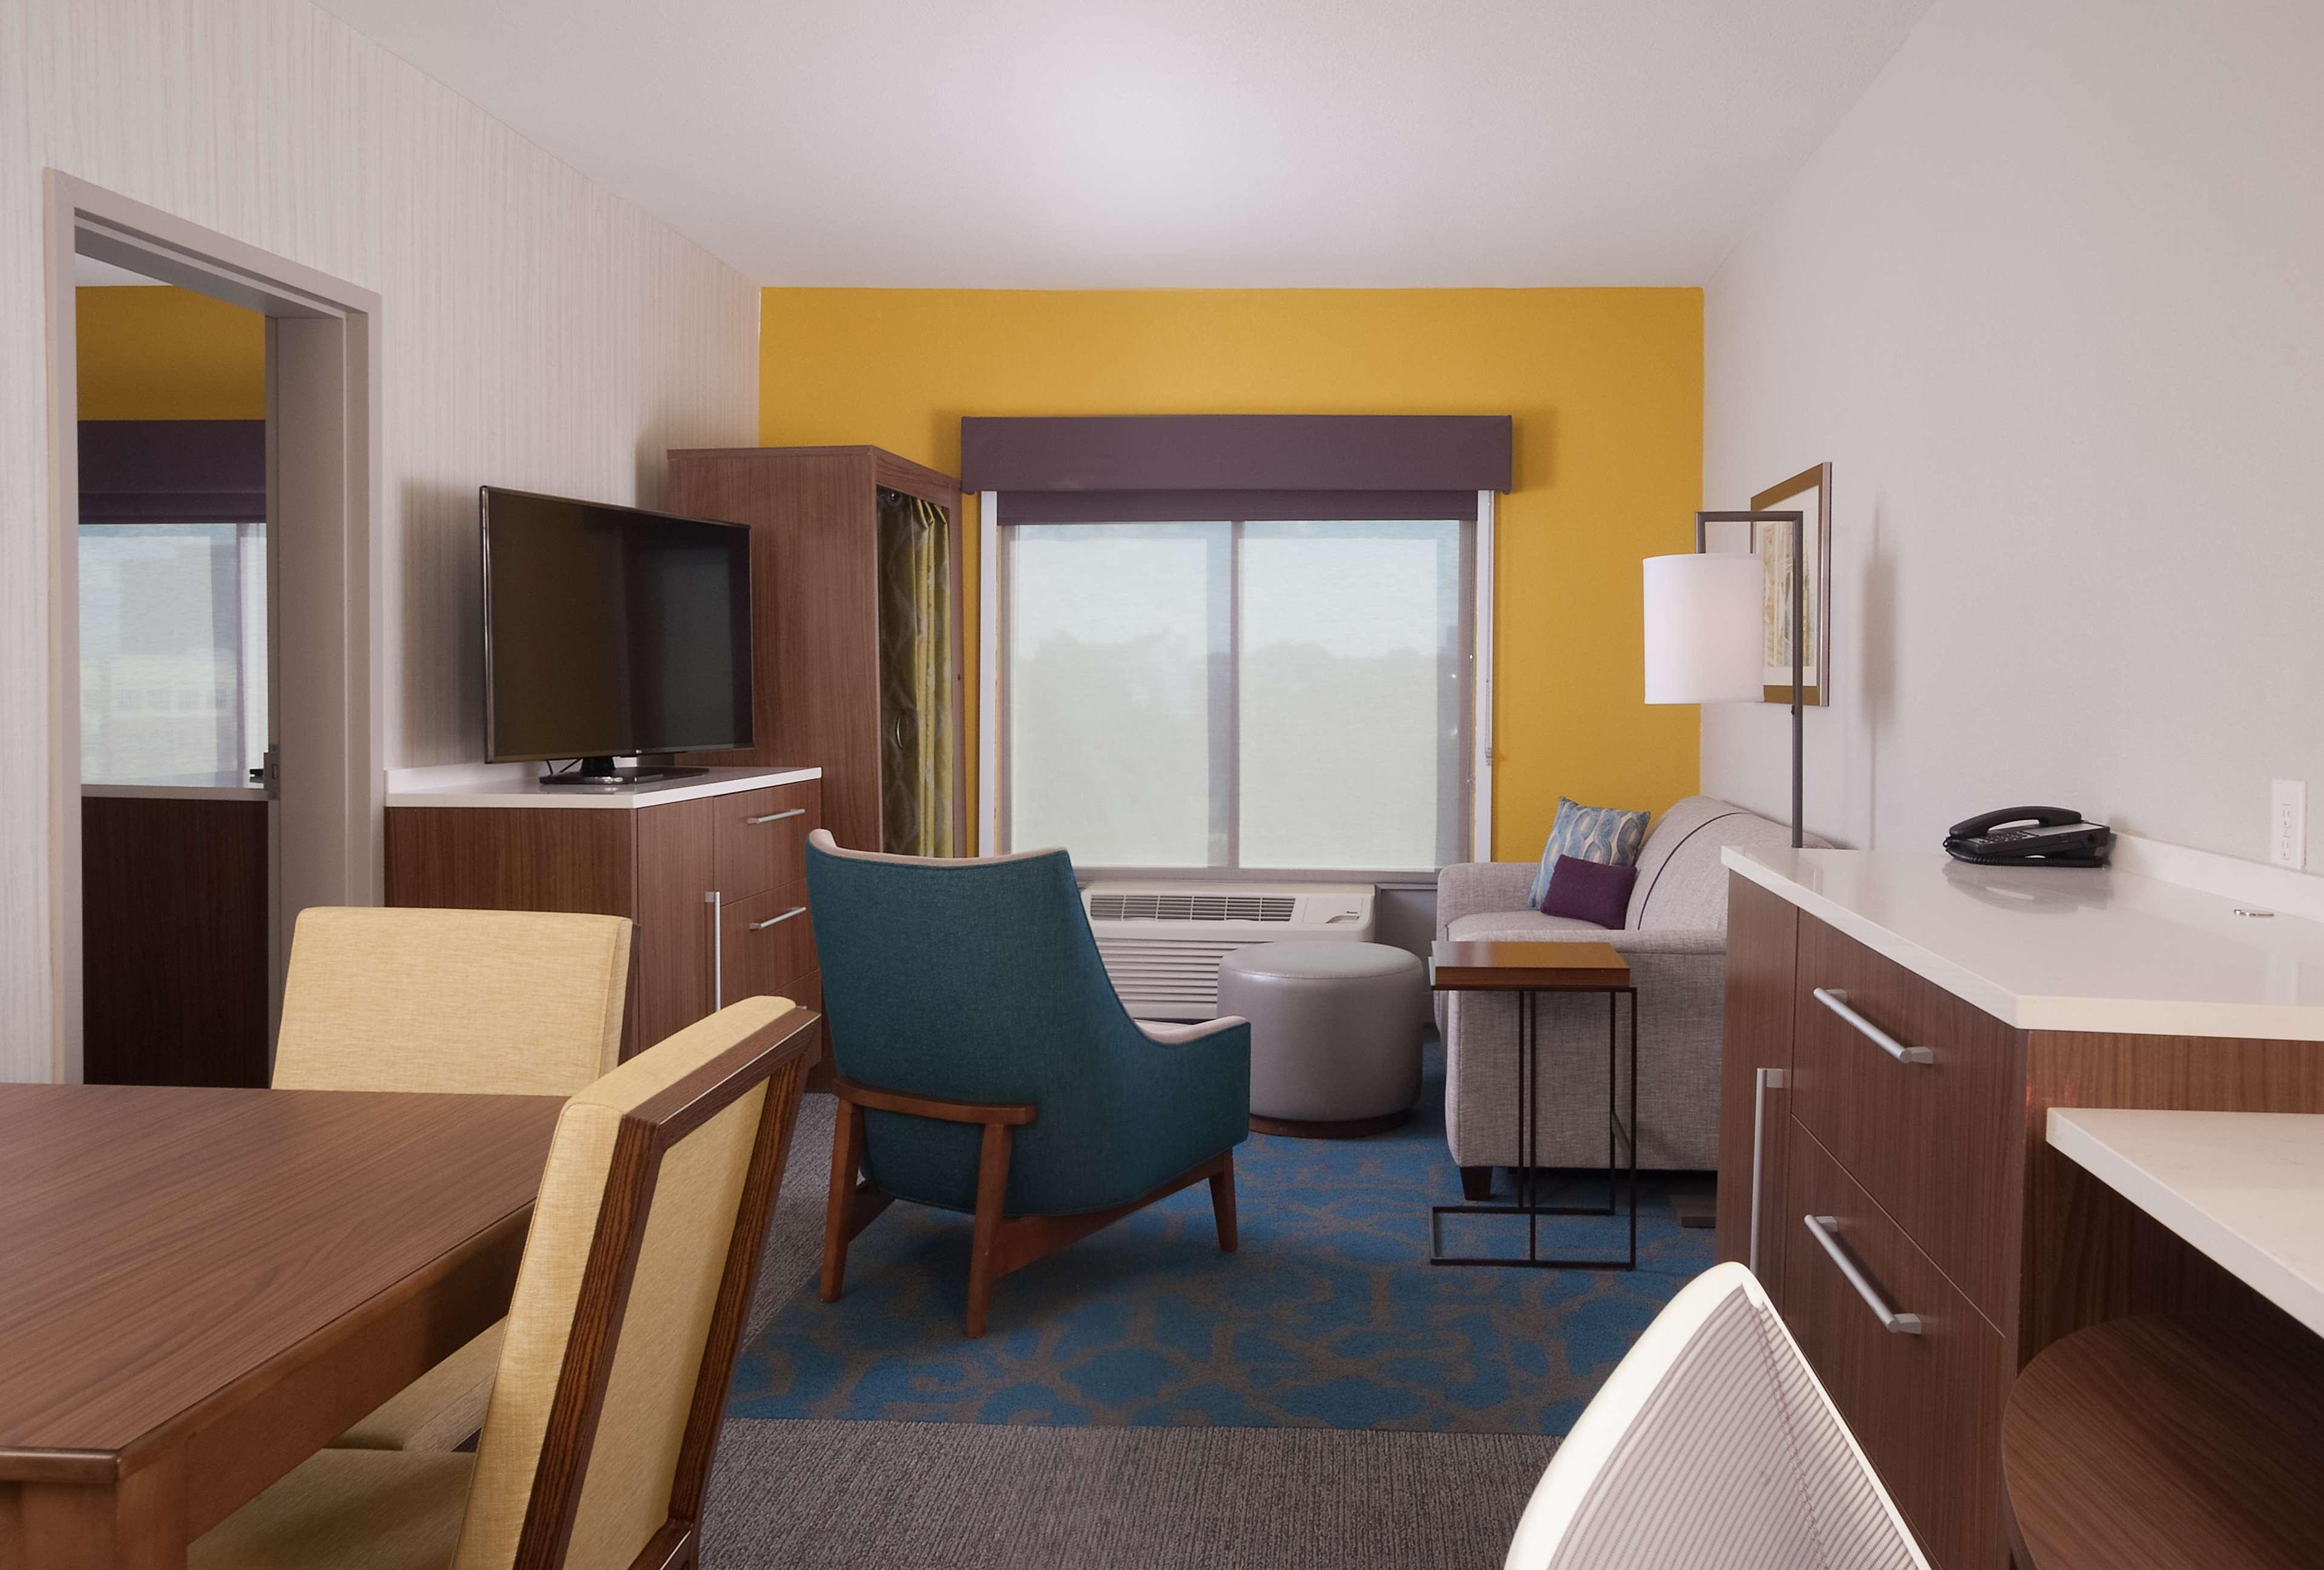 Extended Stay Hotel in GA Atlanta 30328 Home2 Suites by Hilton Atlanta Perimeter Center 6110 Peachtree Dunwoody Road  (770)828-0330